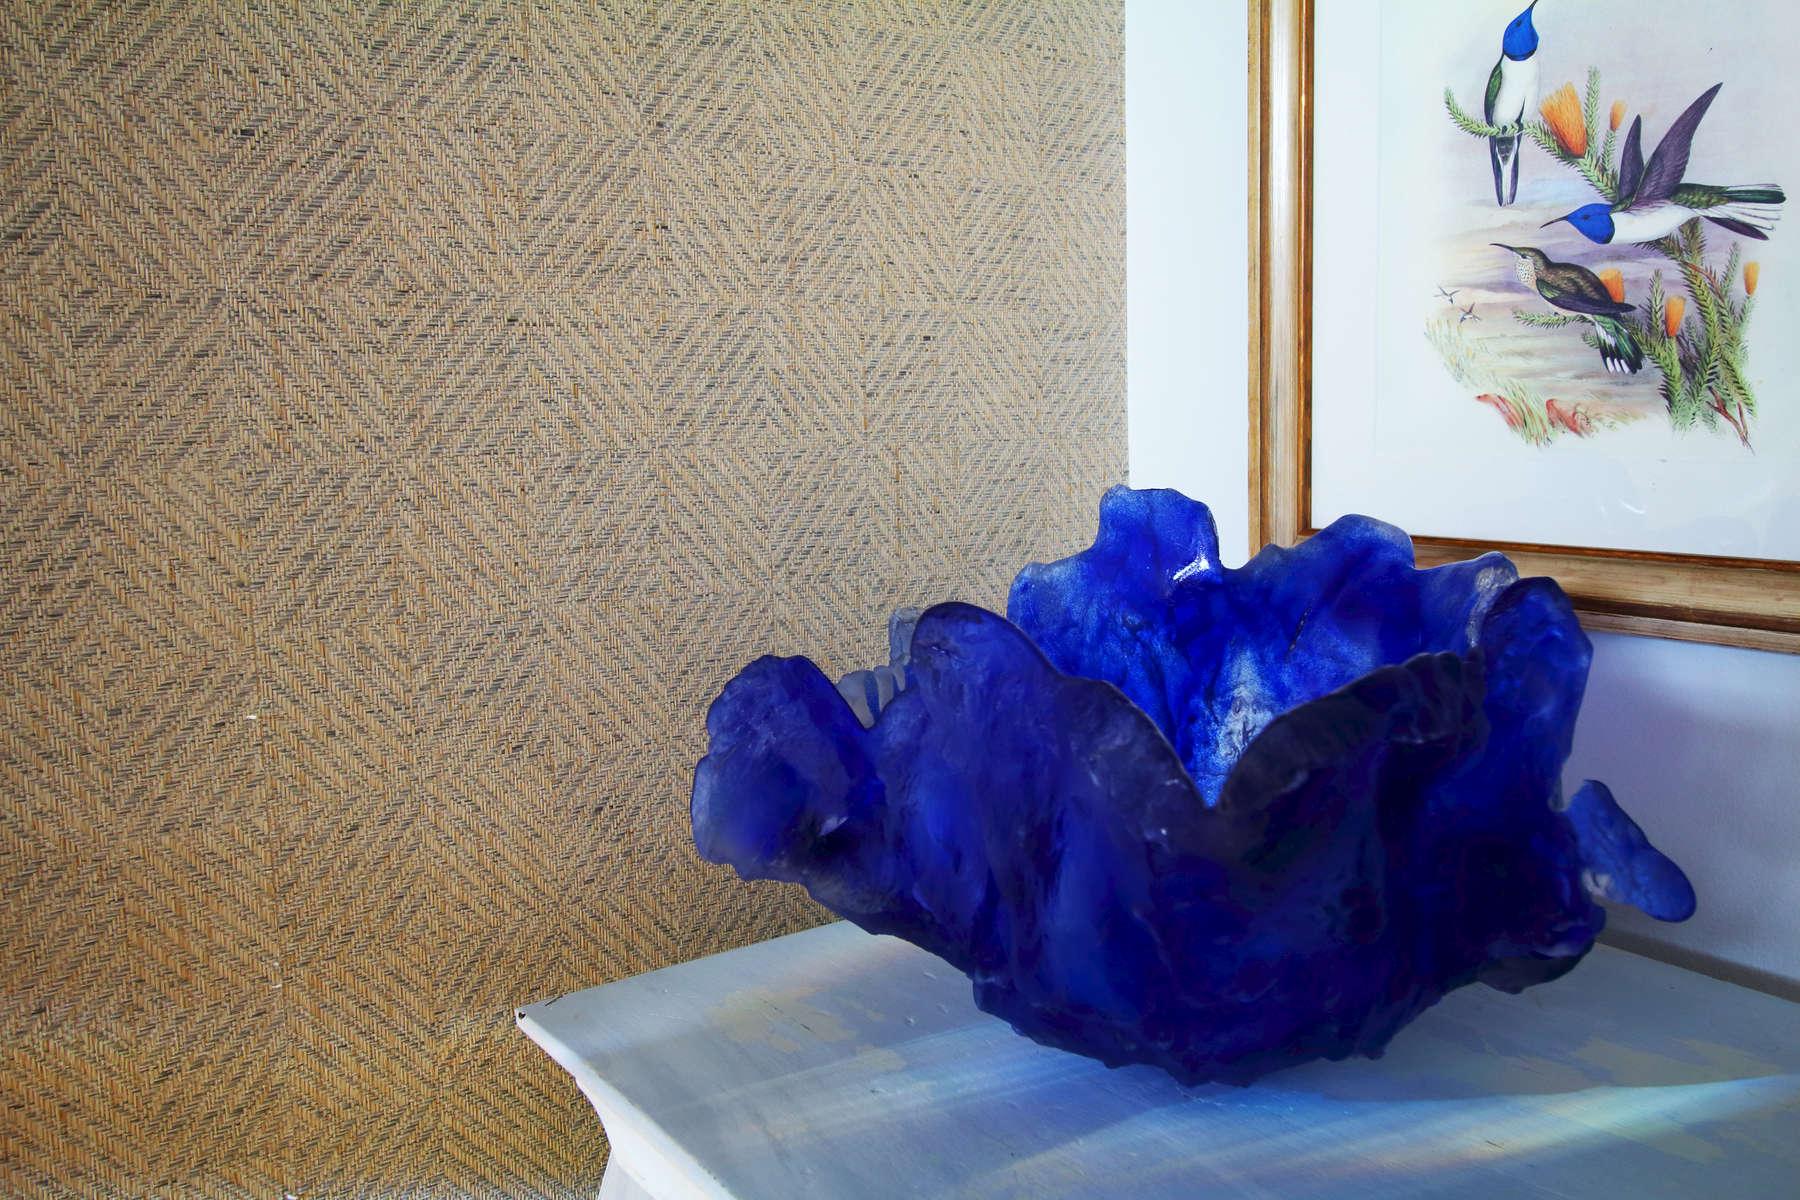 deep blue crystal decorative bowl